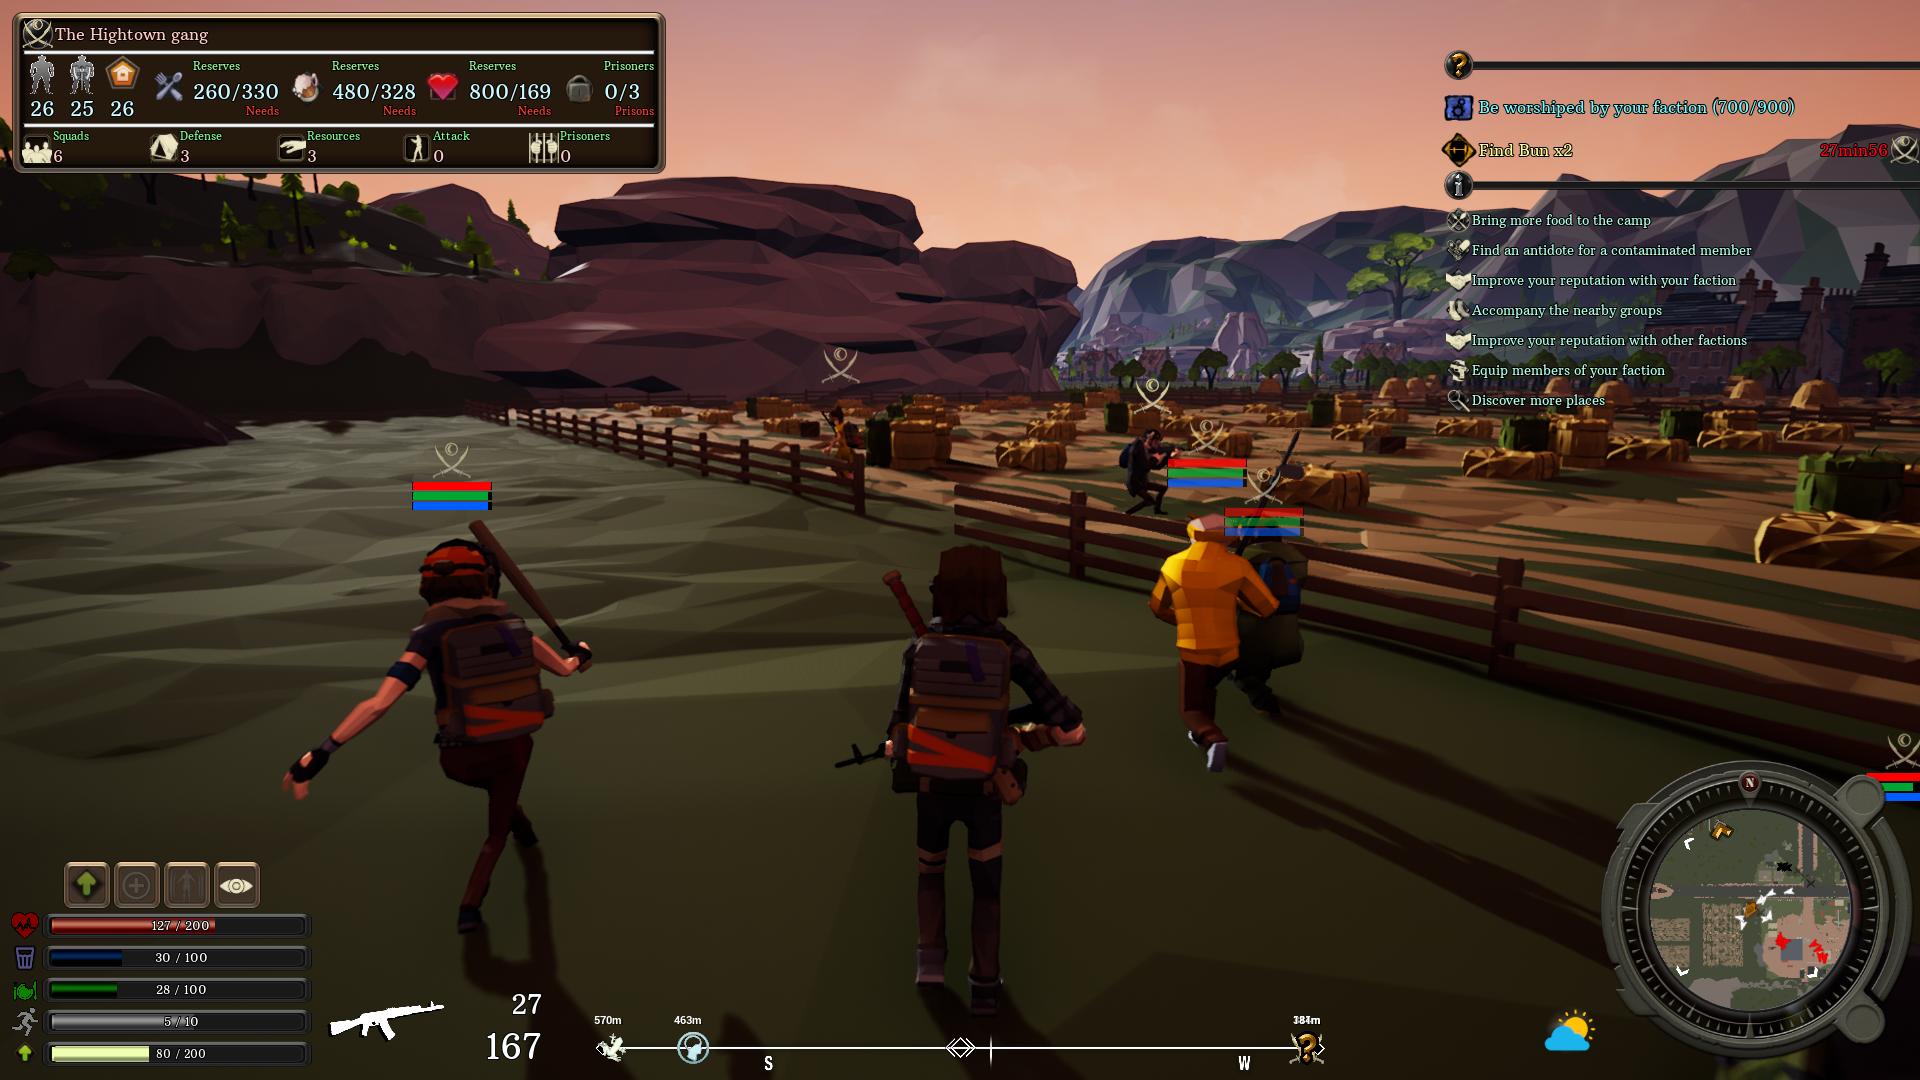 Heavenworld Screenshot 2020 04 1 3